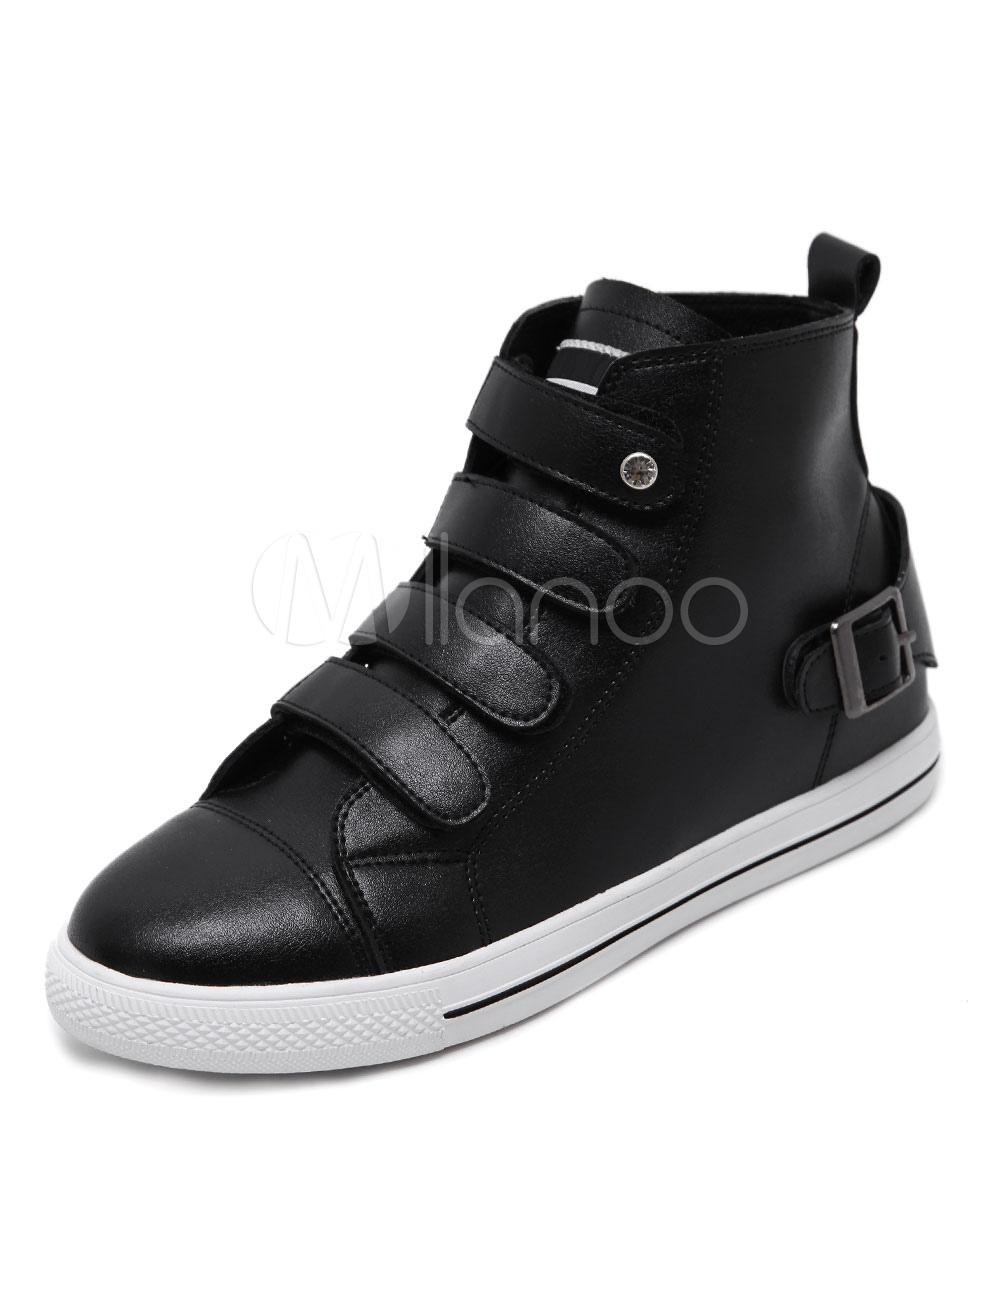 Women's Black Sneakers Round Toe Buckle Detail High Top Sneakers